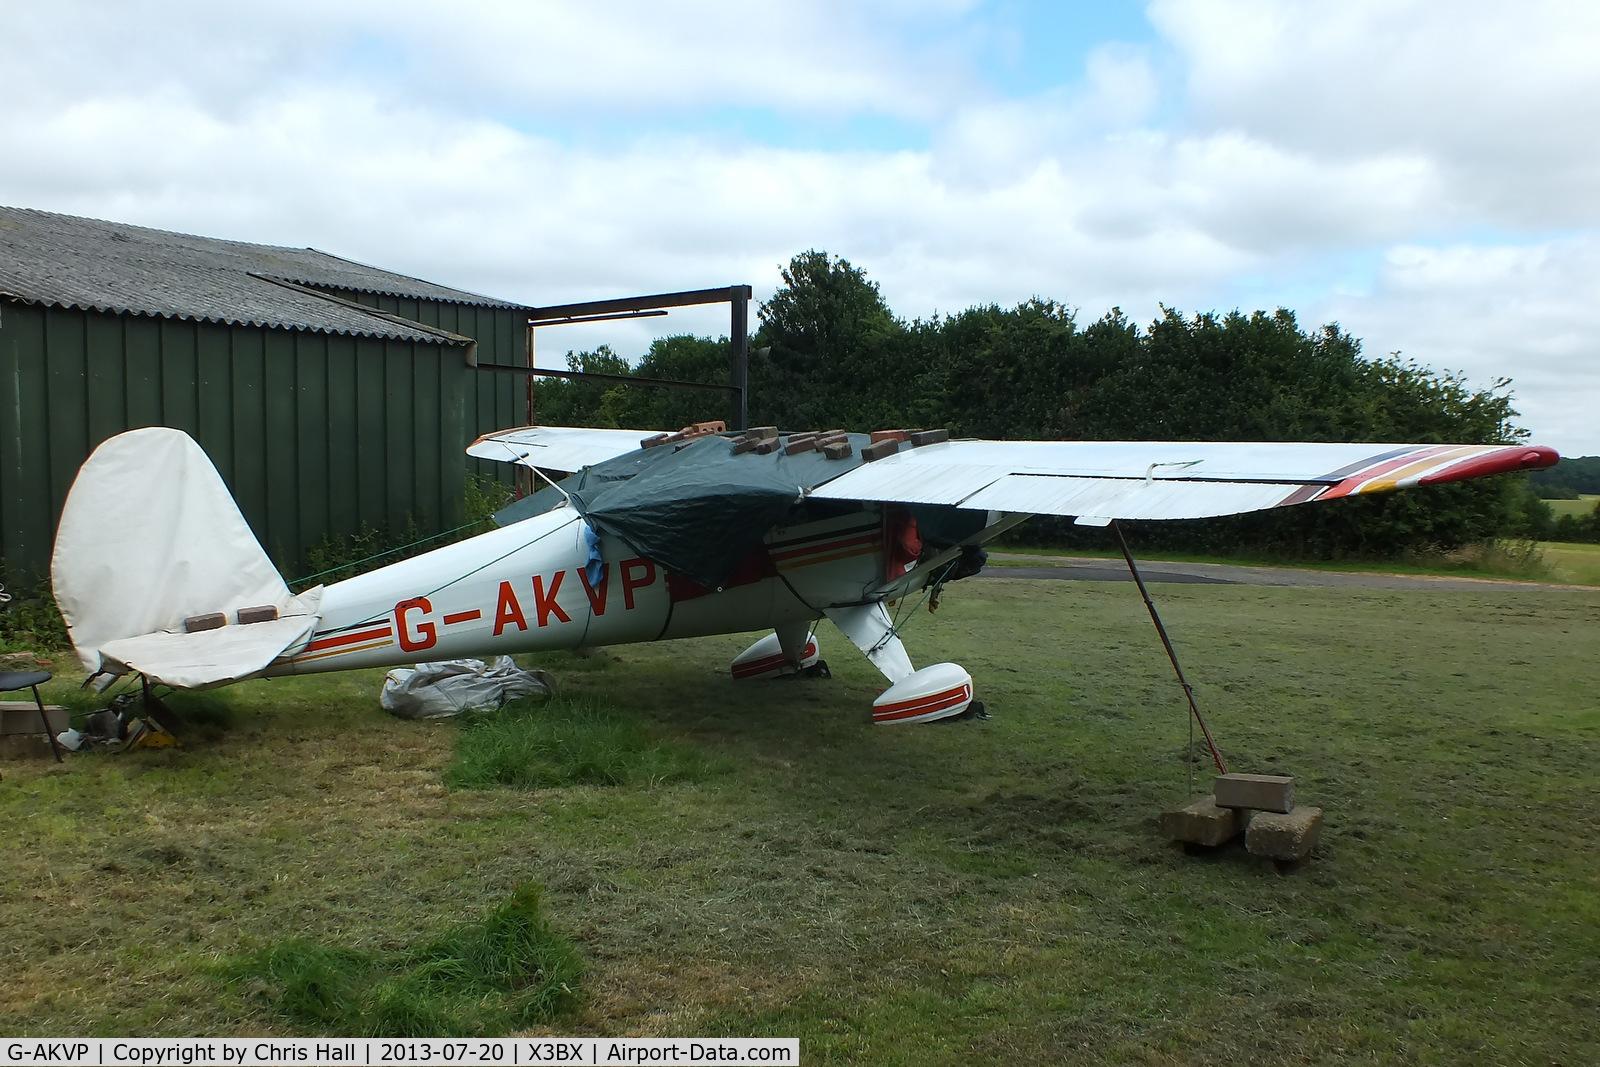 G-AKVP, 1948 Luscombe 8A C/N 5549, at Charity Farm, Baxterley